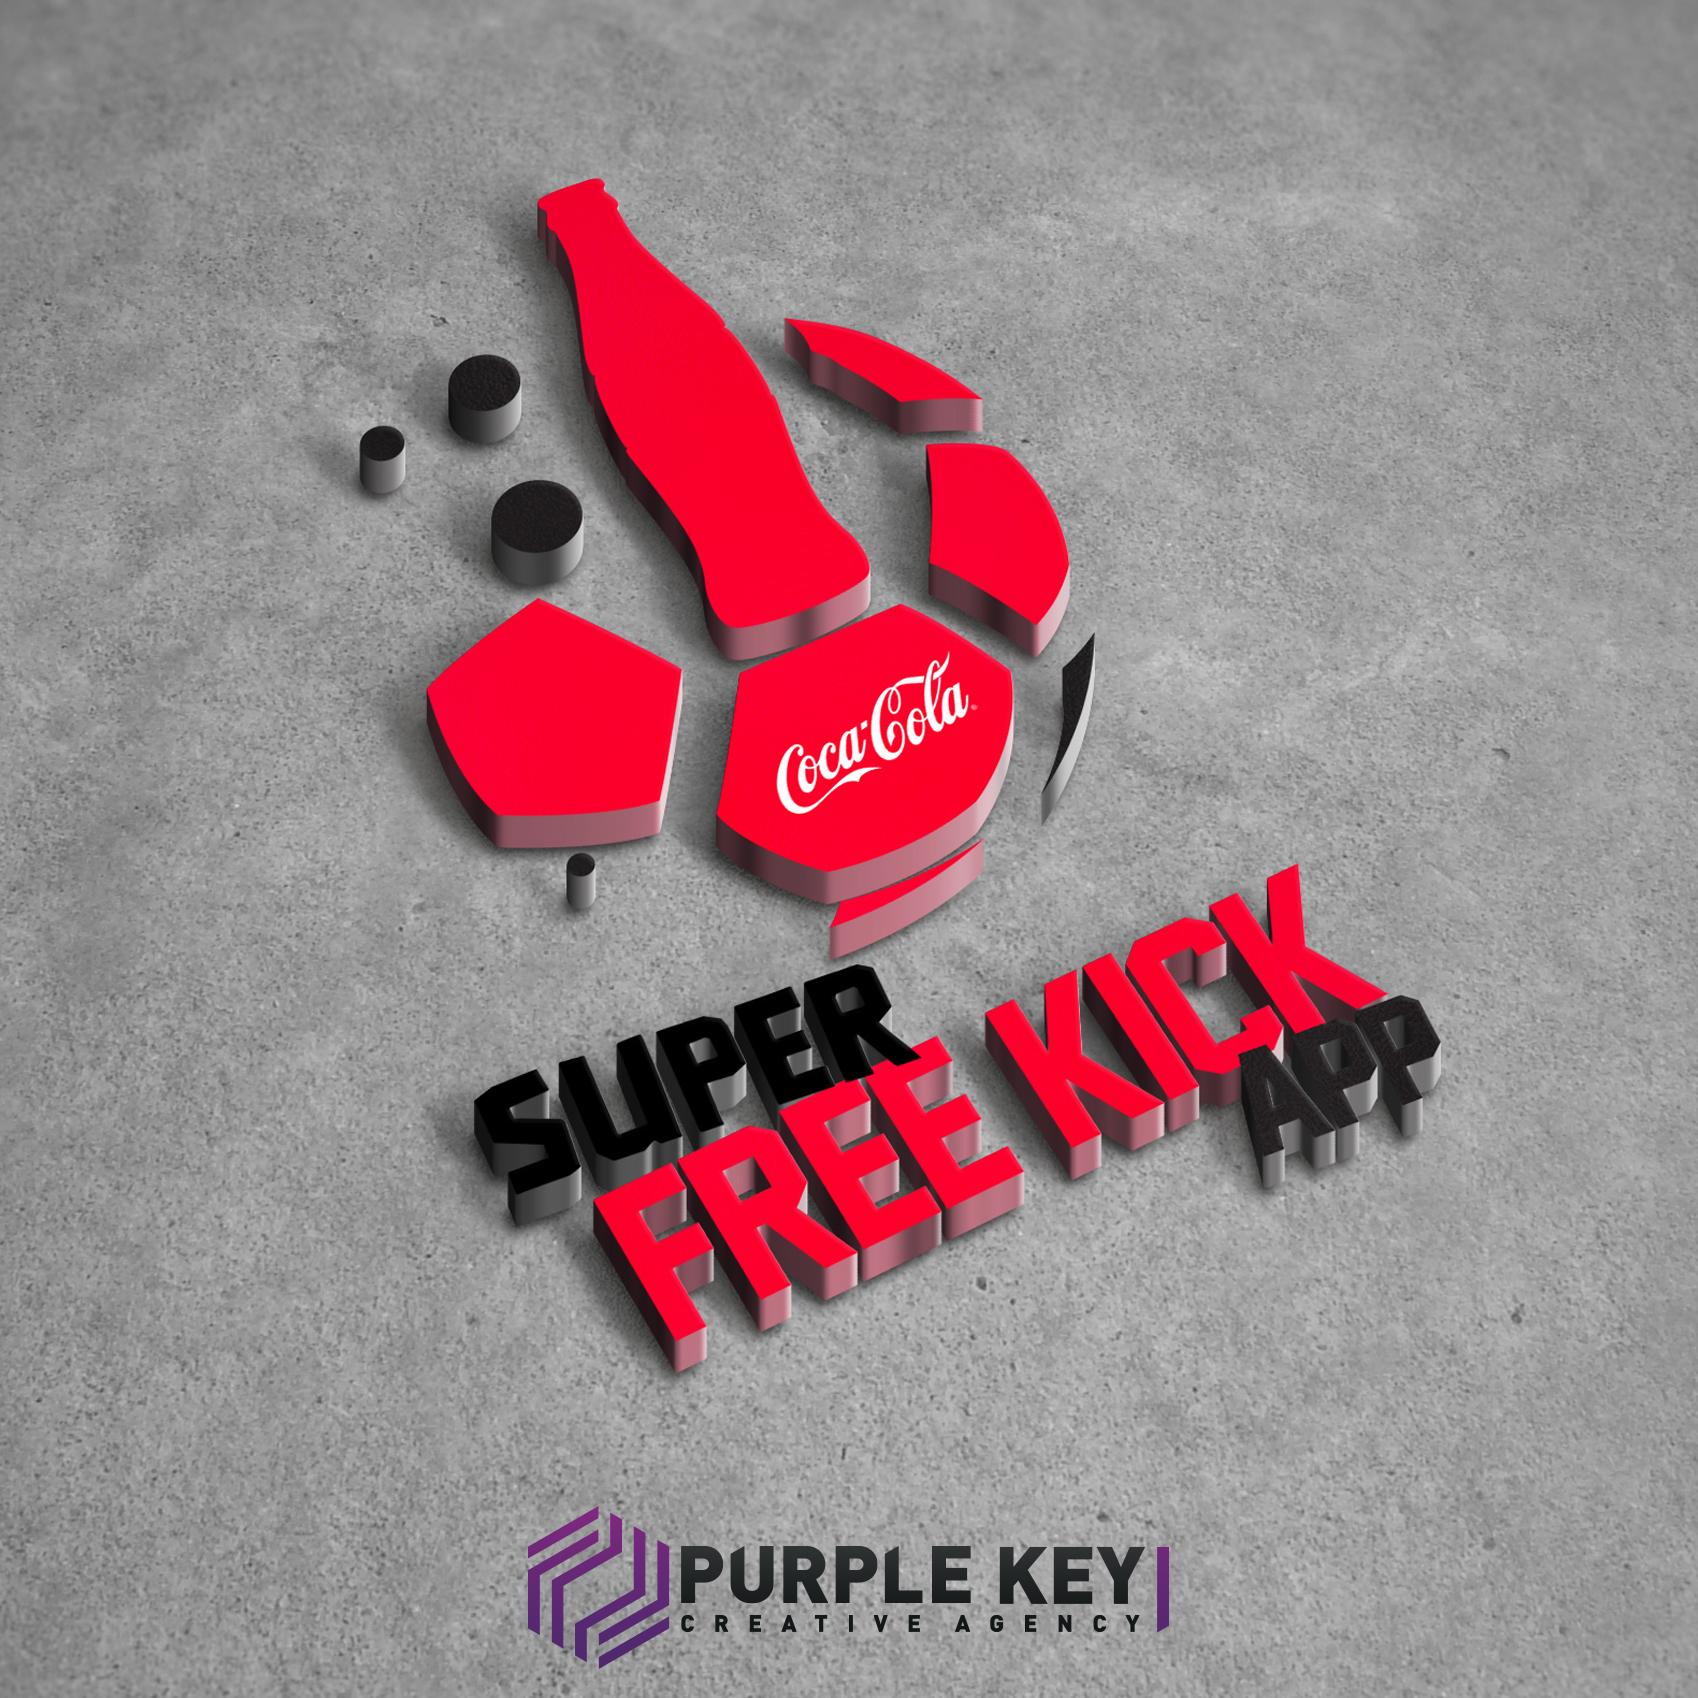 free kick CC app logo